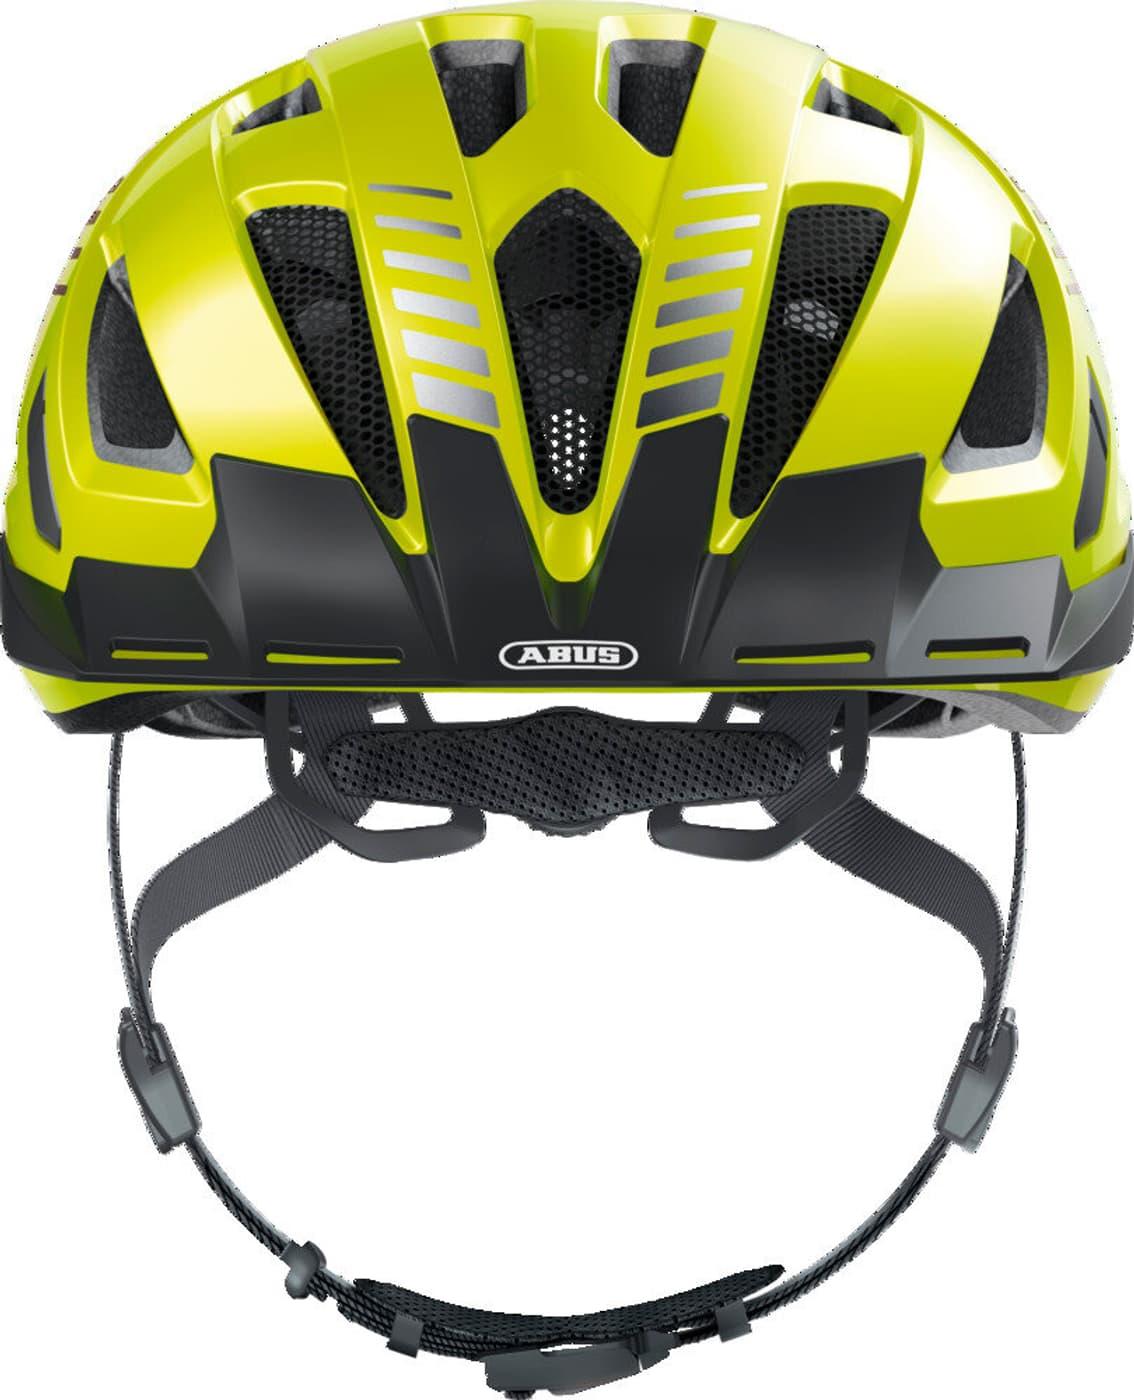 ABUS URBAN-I 3.0 Casco da bicicletta unisex per adulti